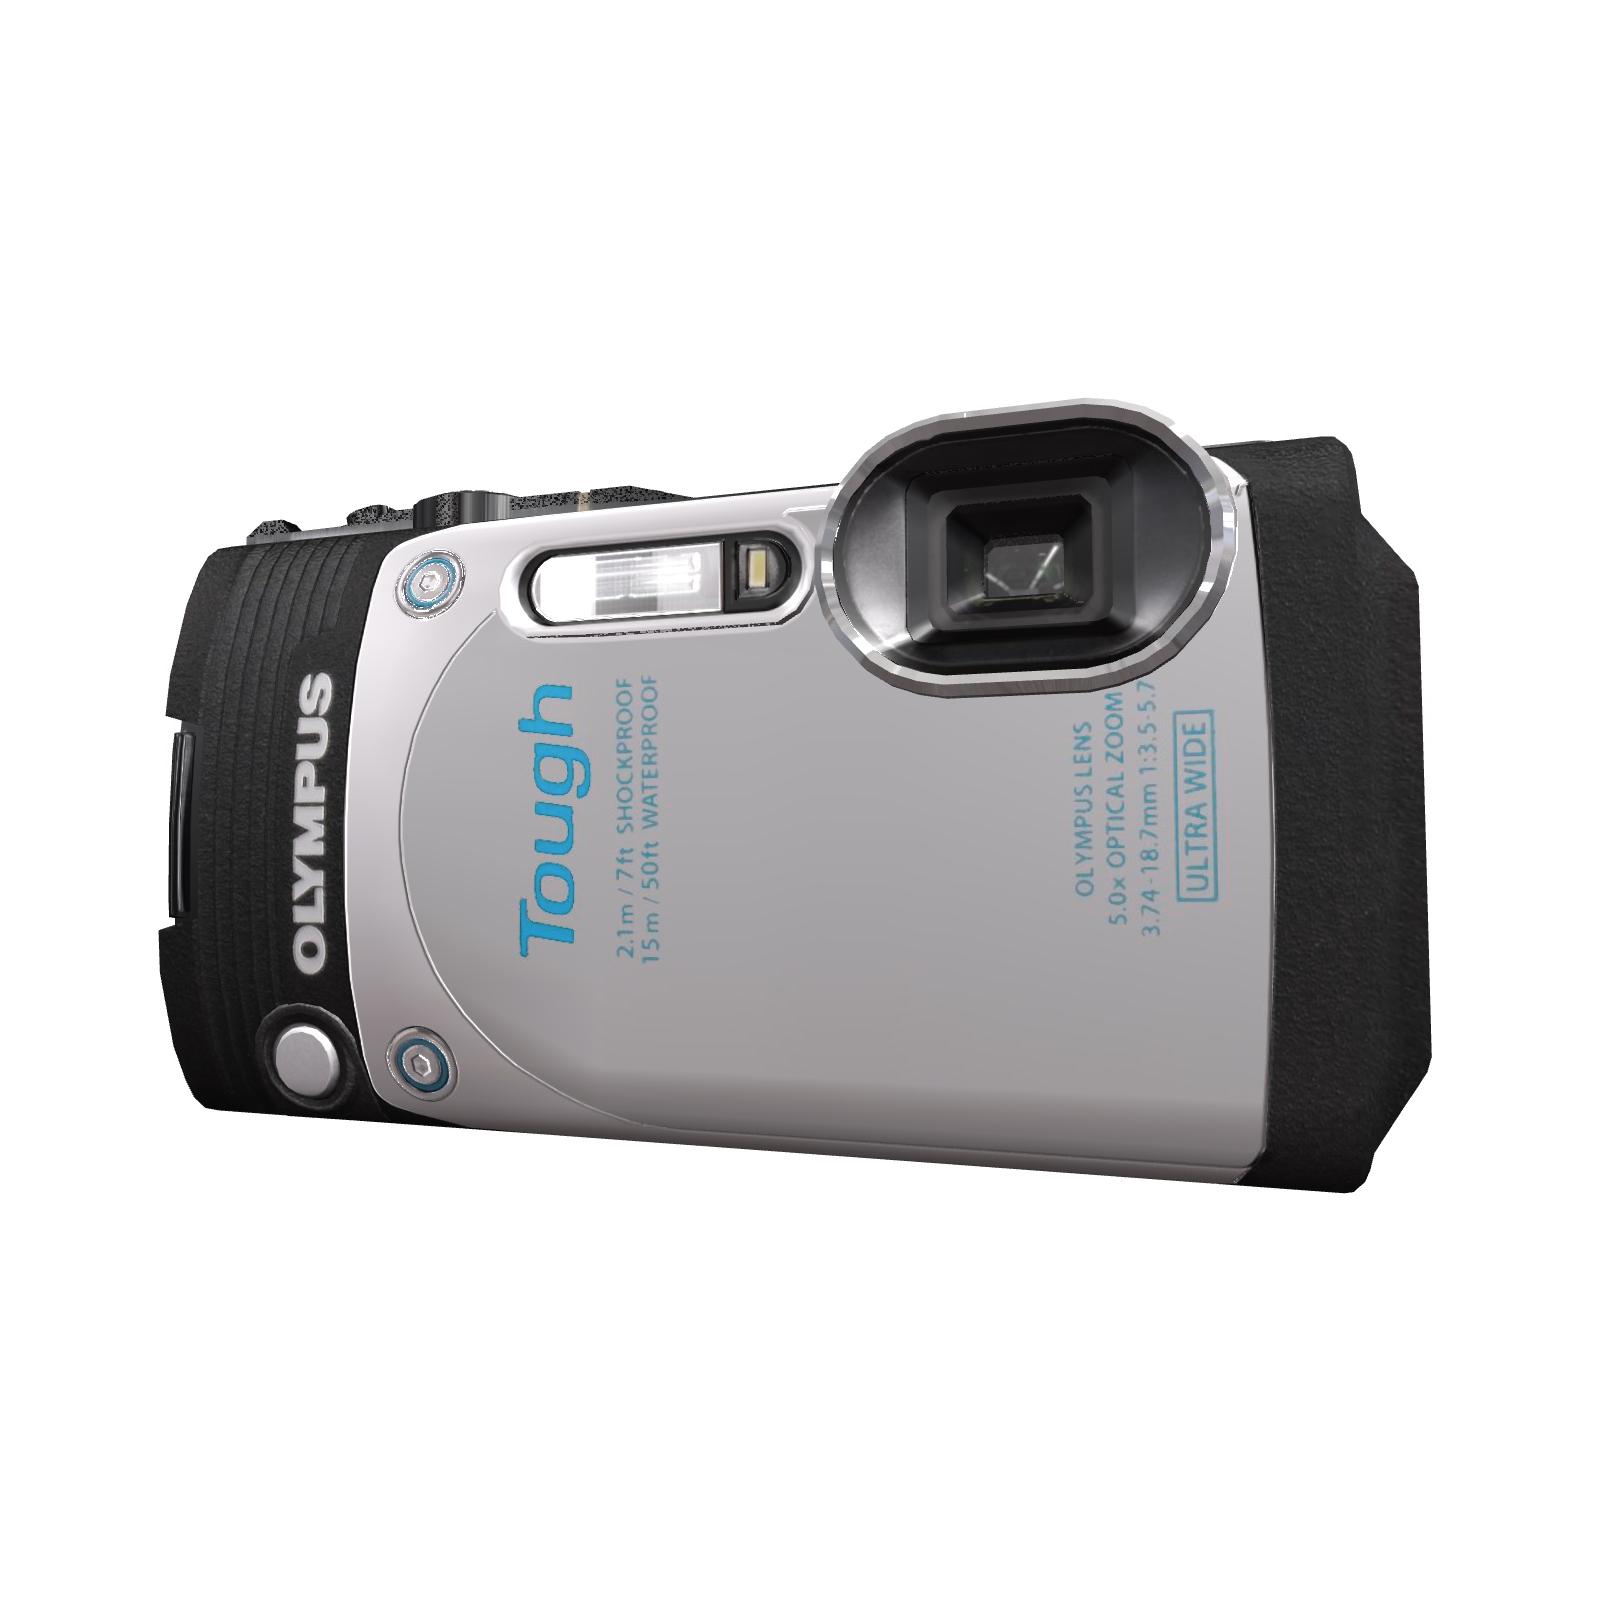 Цифровой фотоаппарат OLYMPUS Tough TG-870 White (Waterproof - 15m